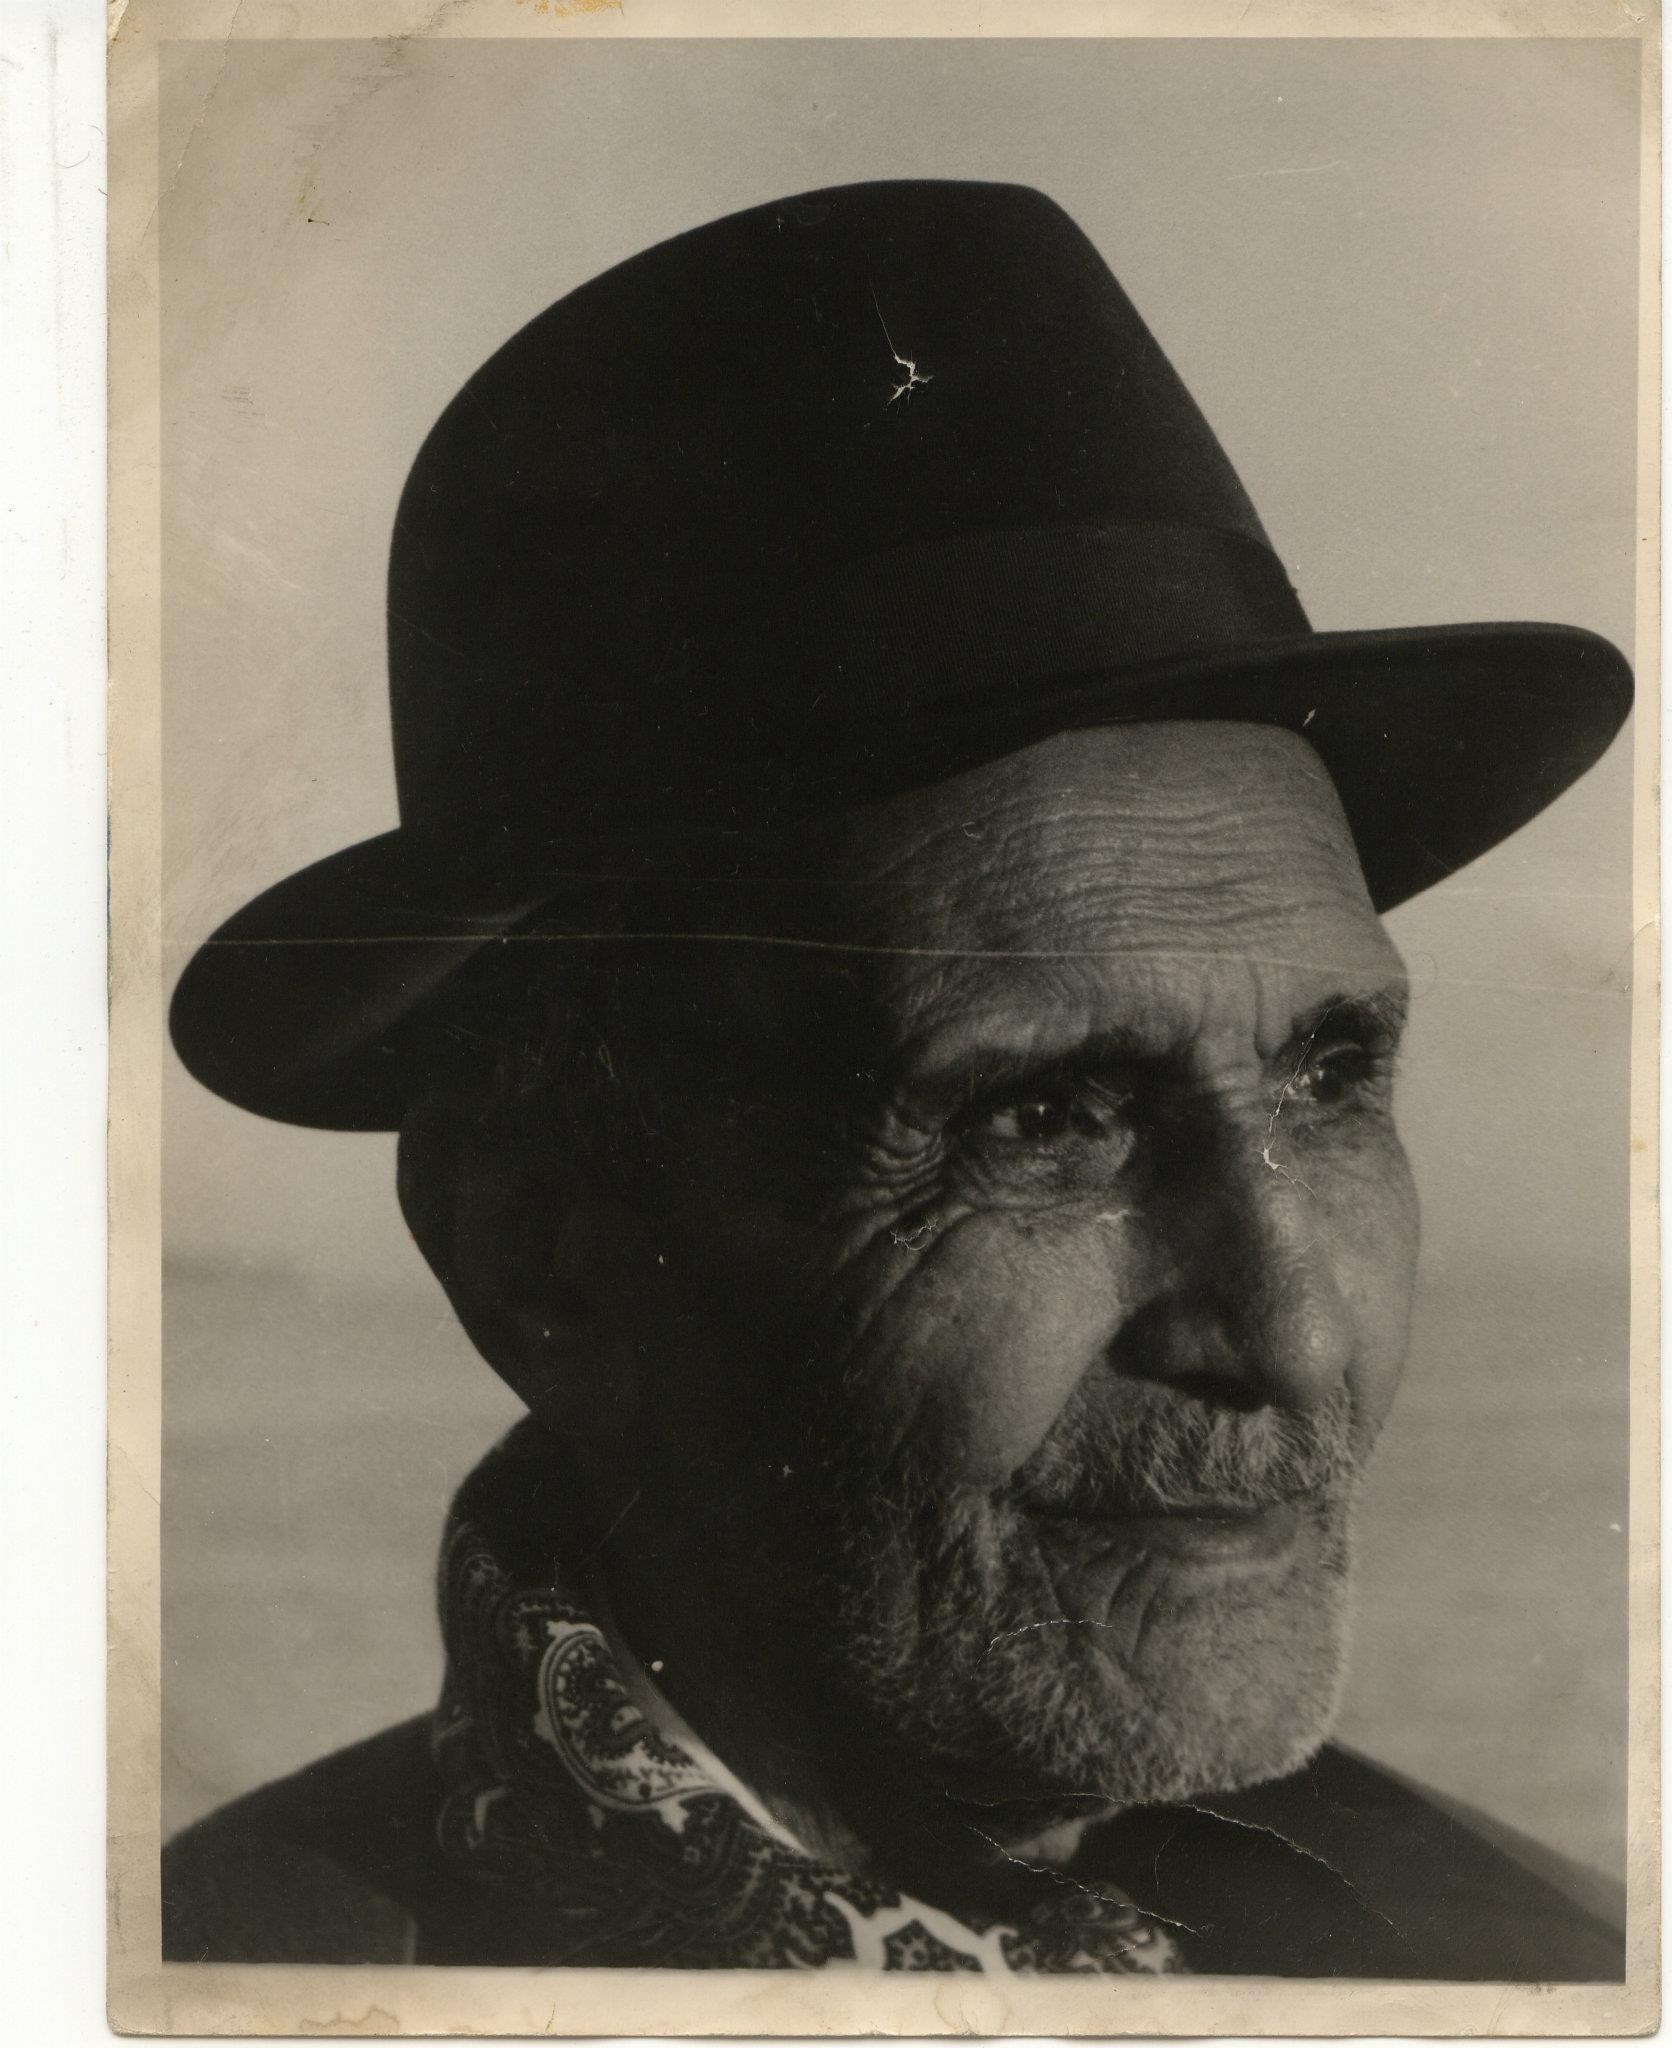 ostad-abdollah-davami-nasehpour-archive